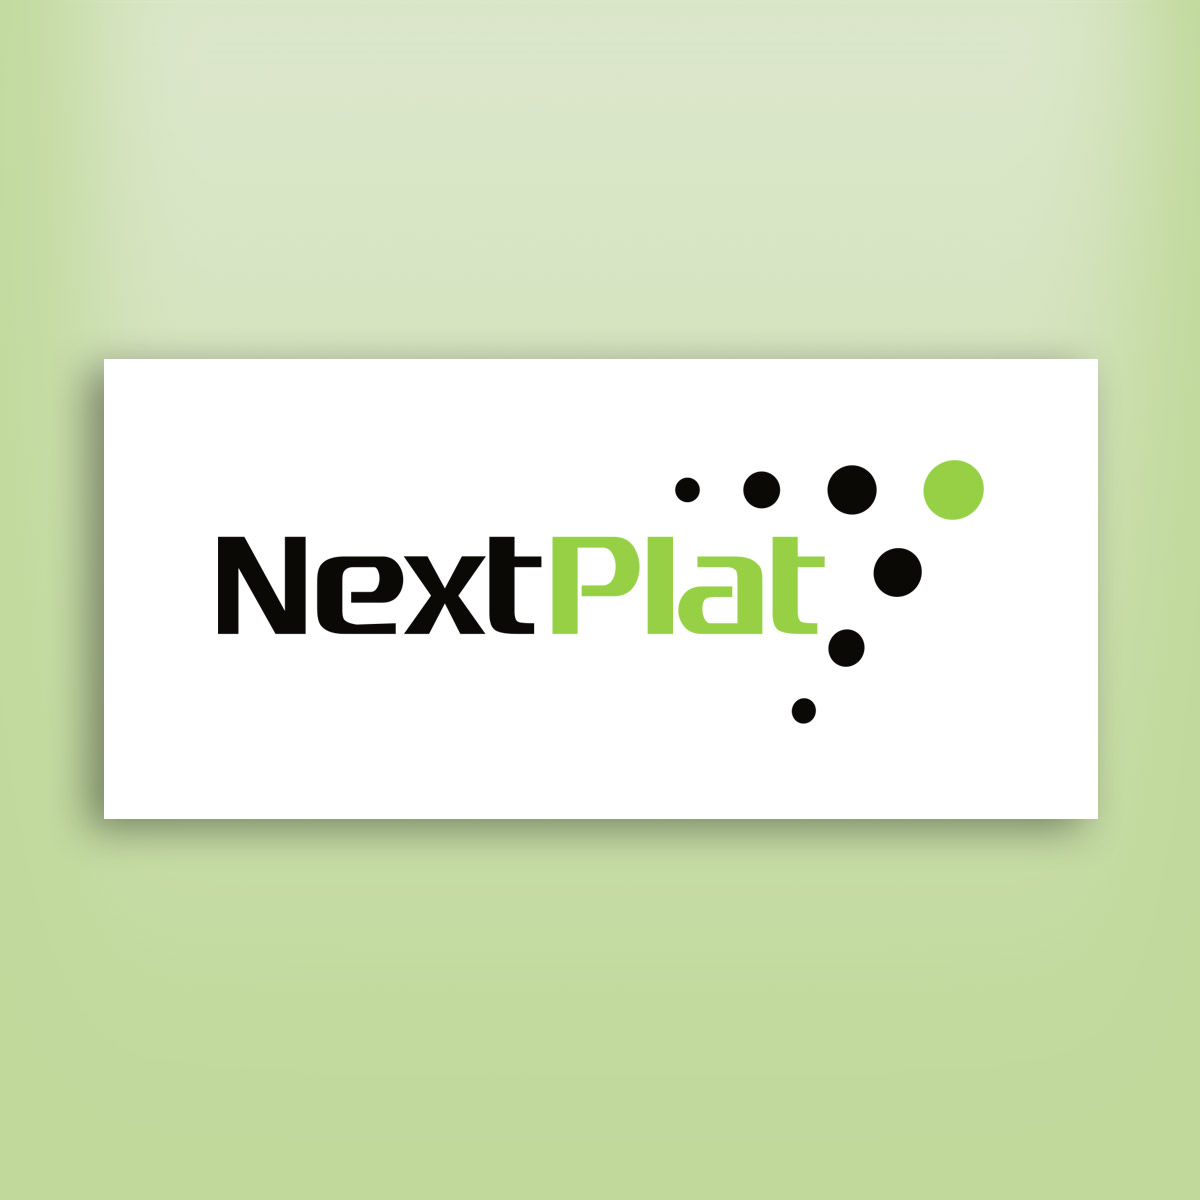 diseño de logotipo NextPlat